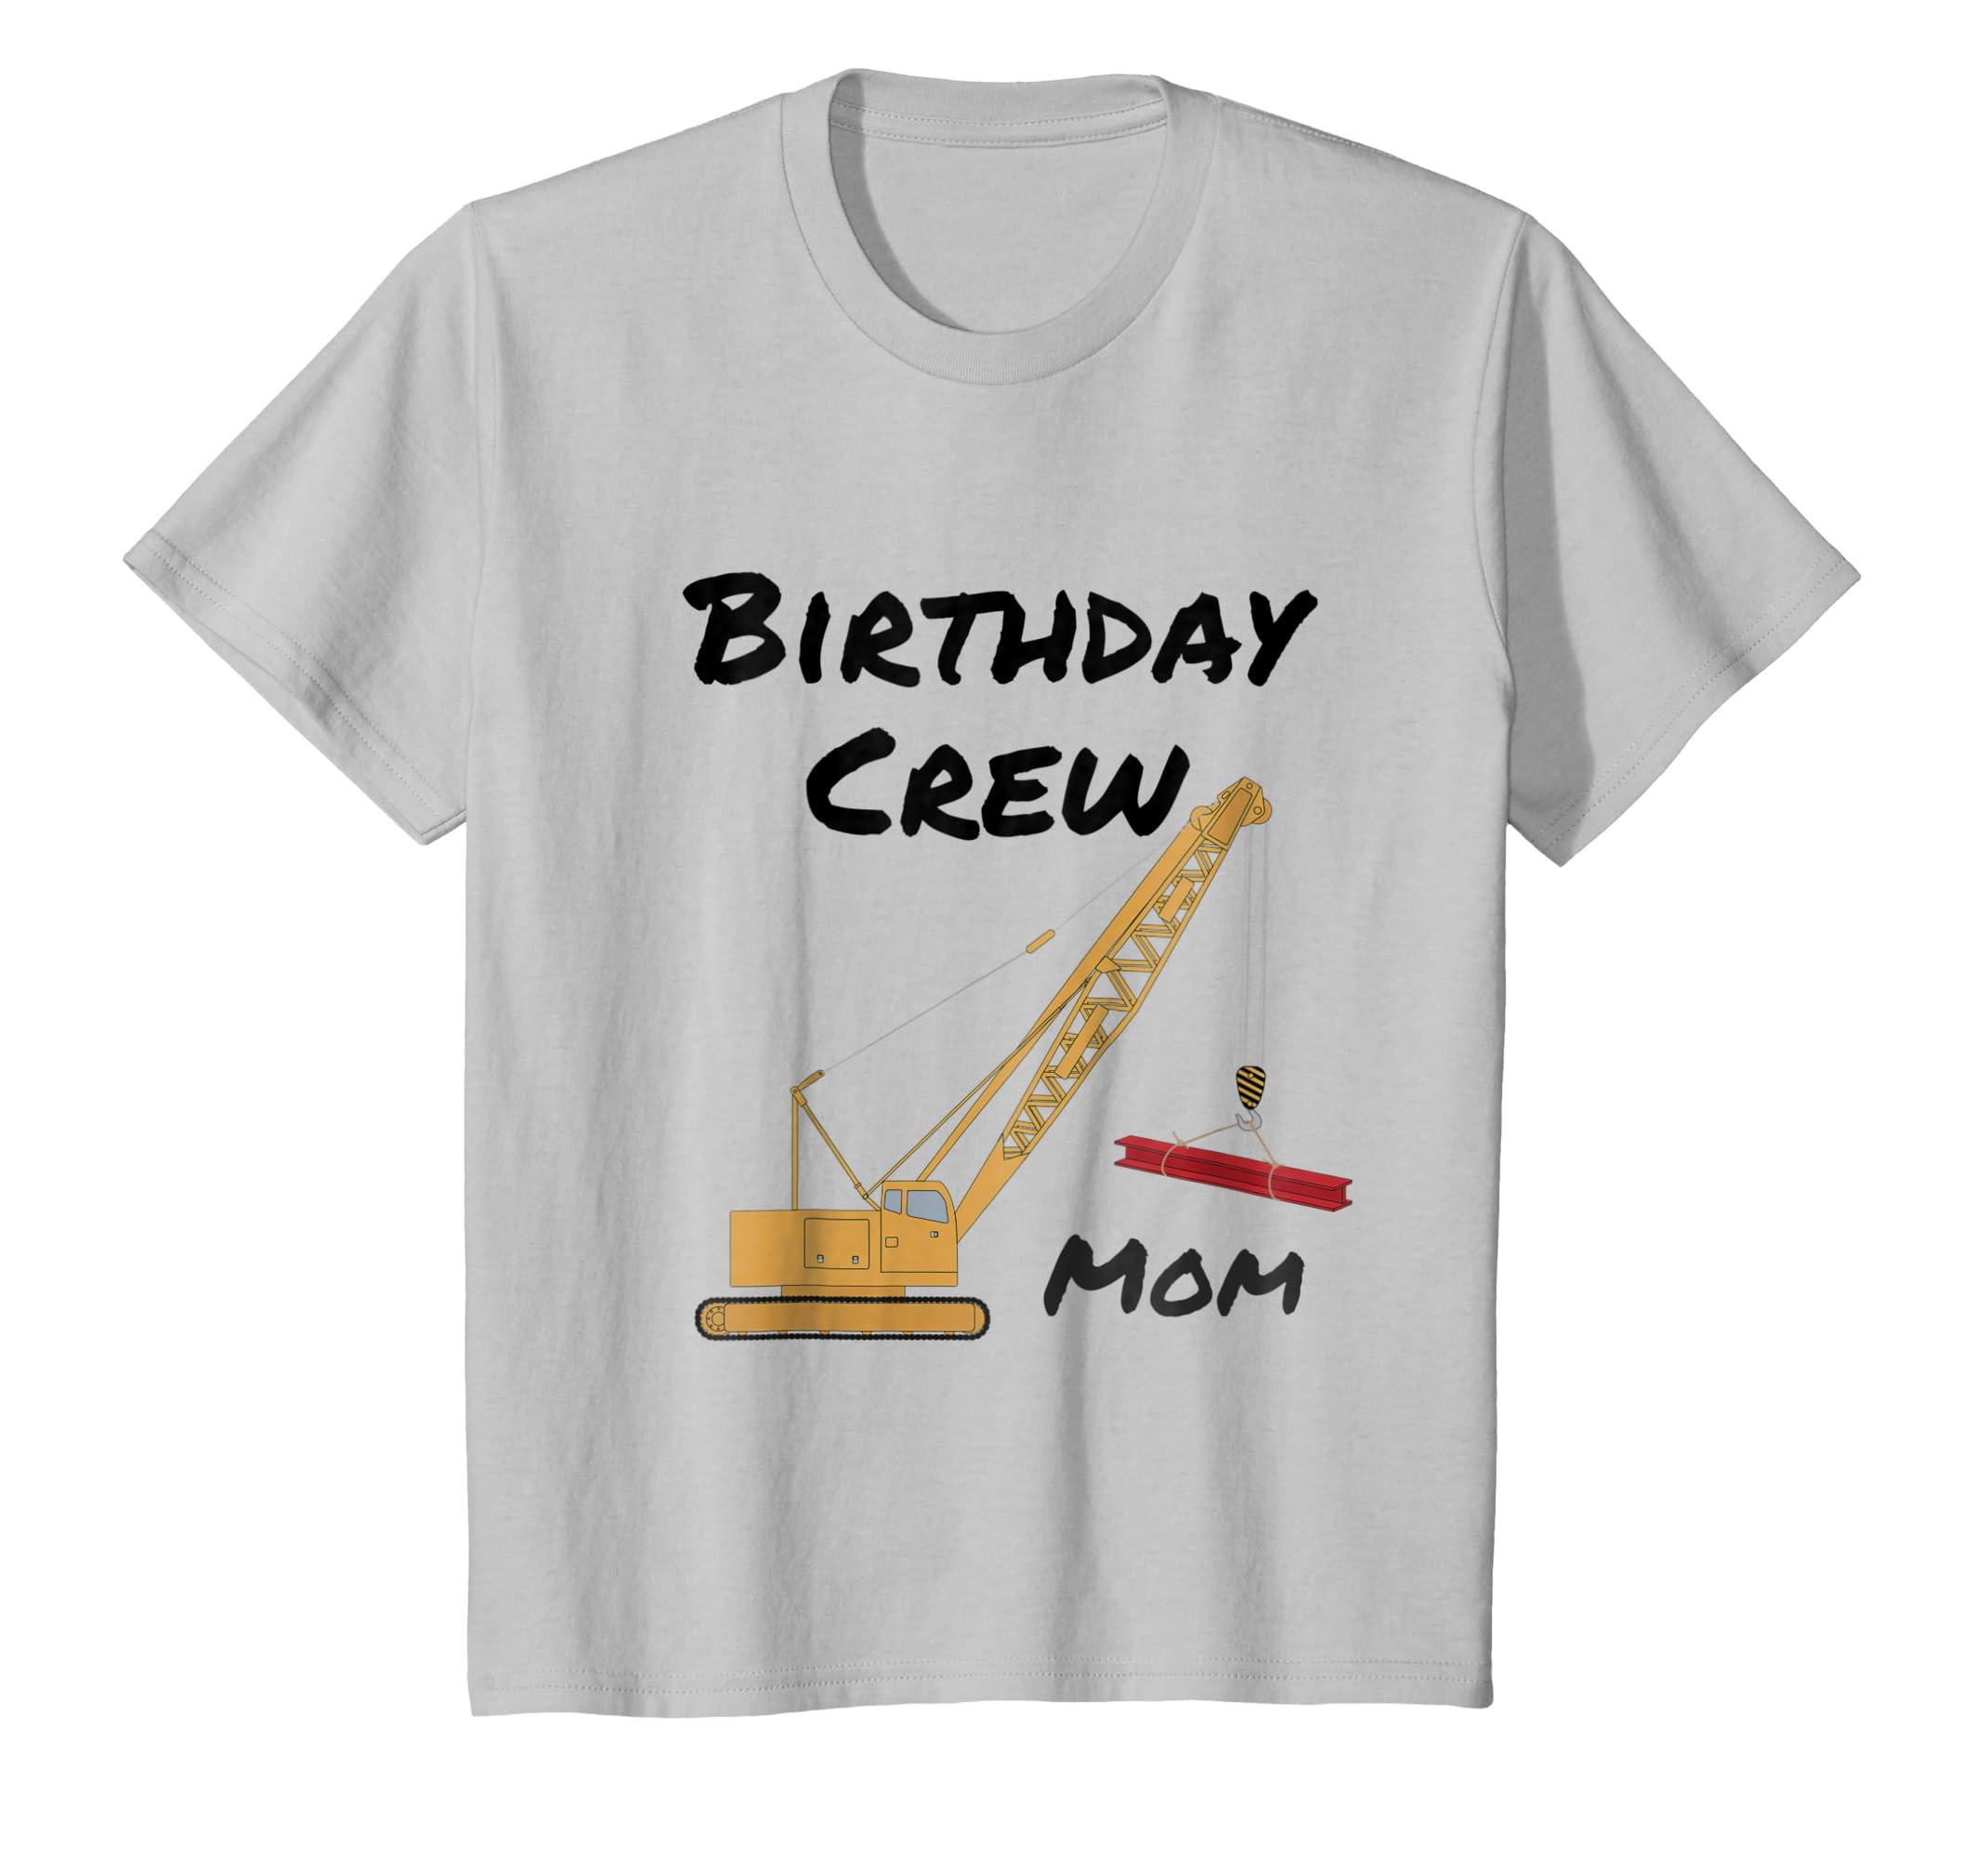 Amazon Birthday Crew Mom Crane Construction Party T Shirt Clothing